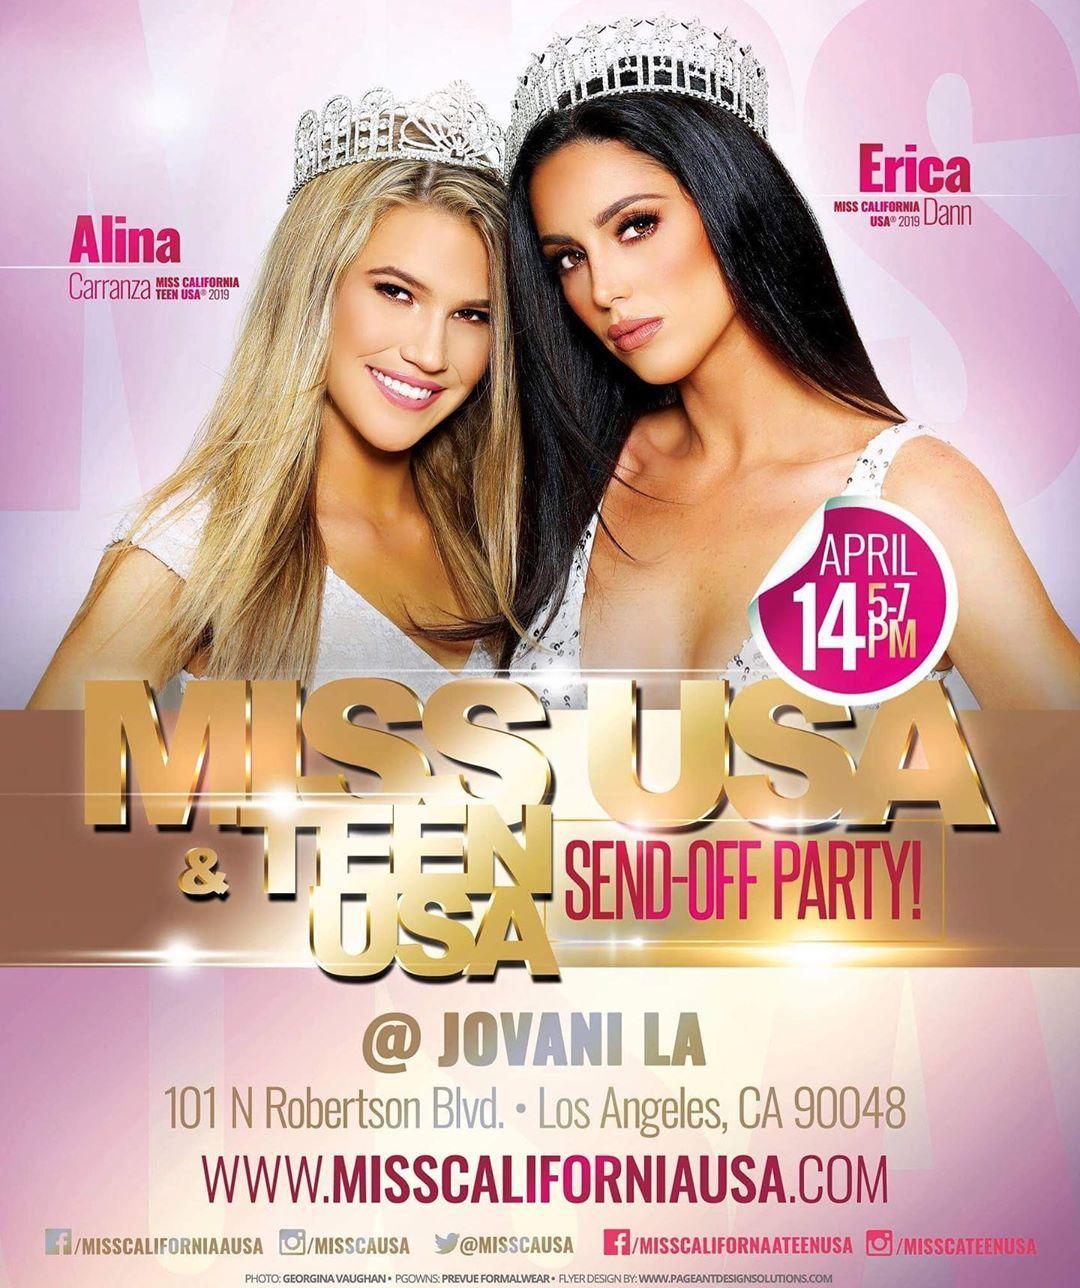 erica dann, miss california 2019. - Página 3 57000879_2319904888255426_7098590929378383721_n